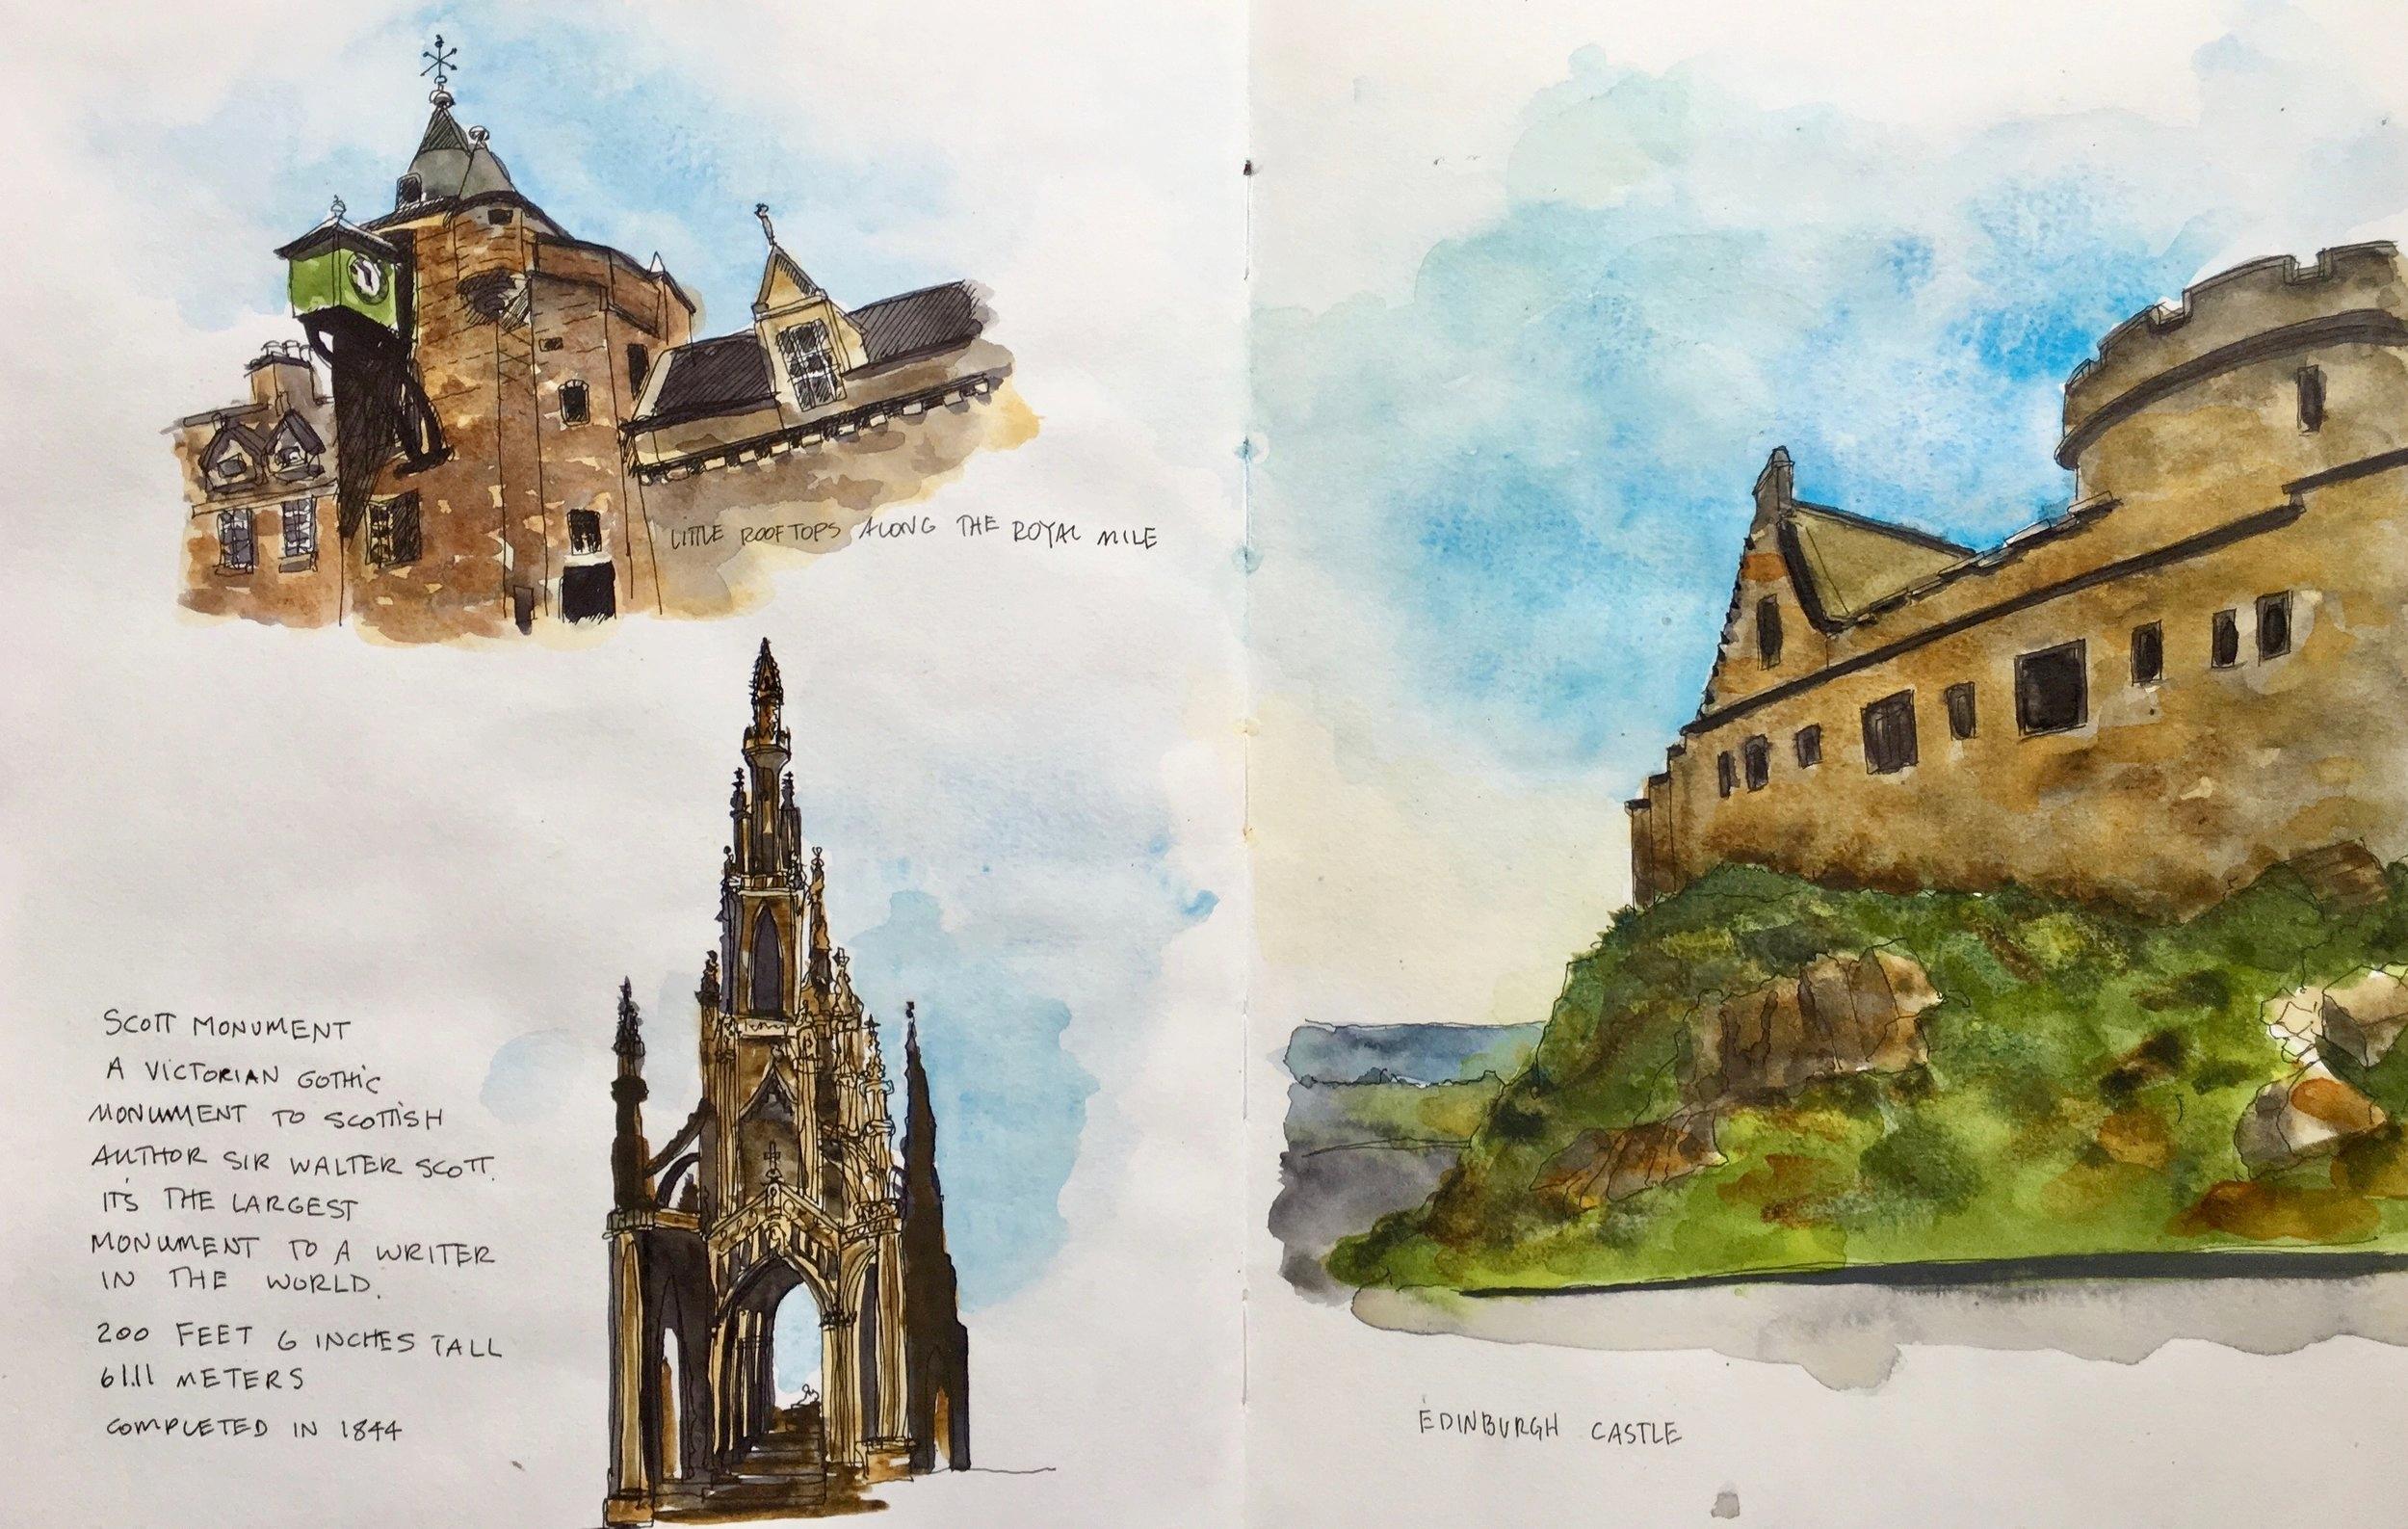 Scenes from our touring through Edinburgh.